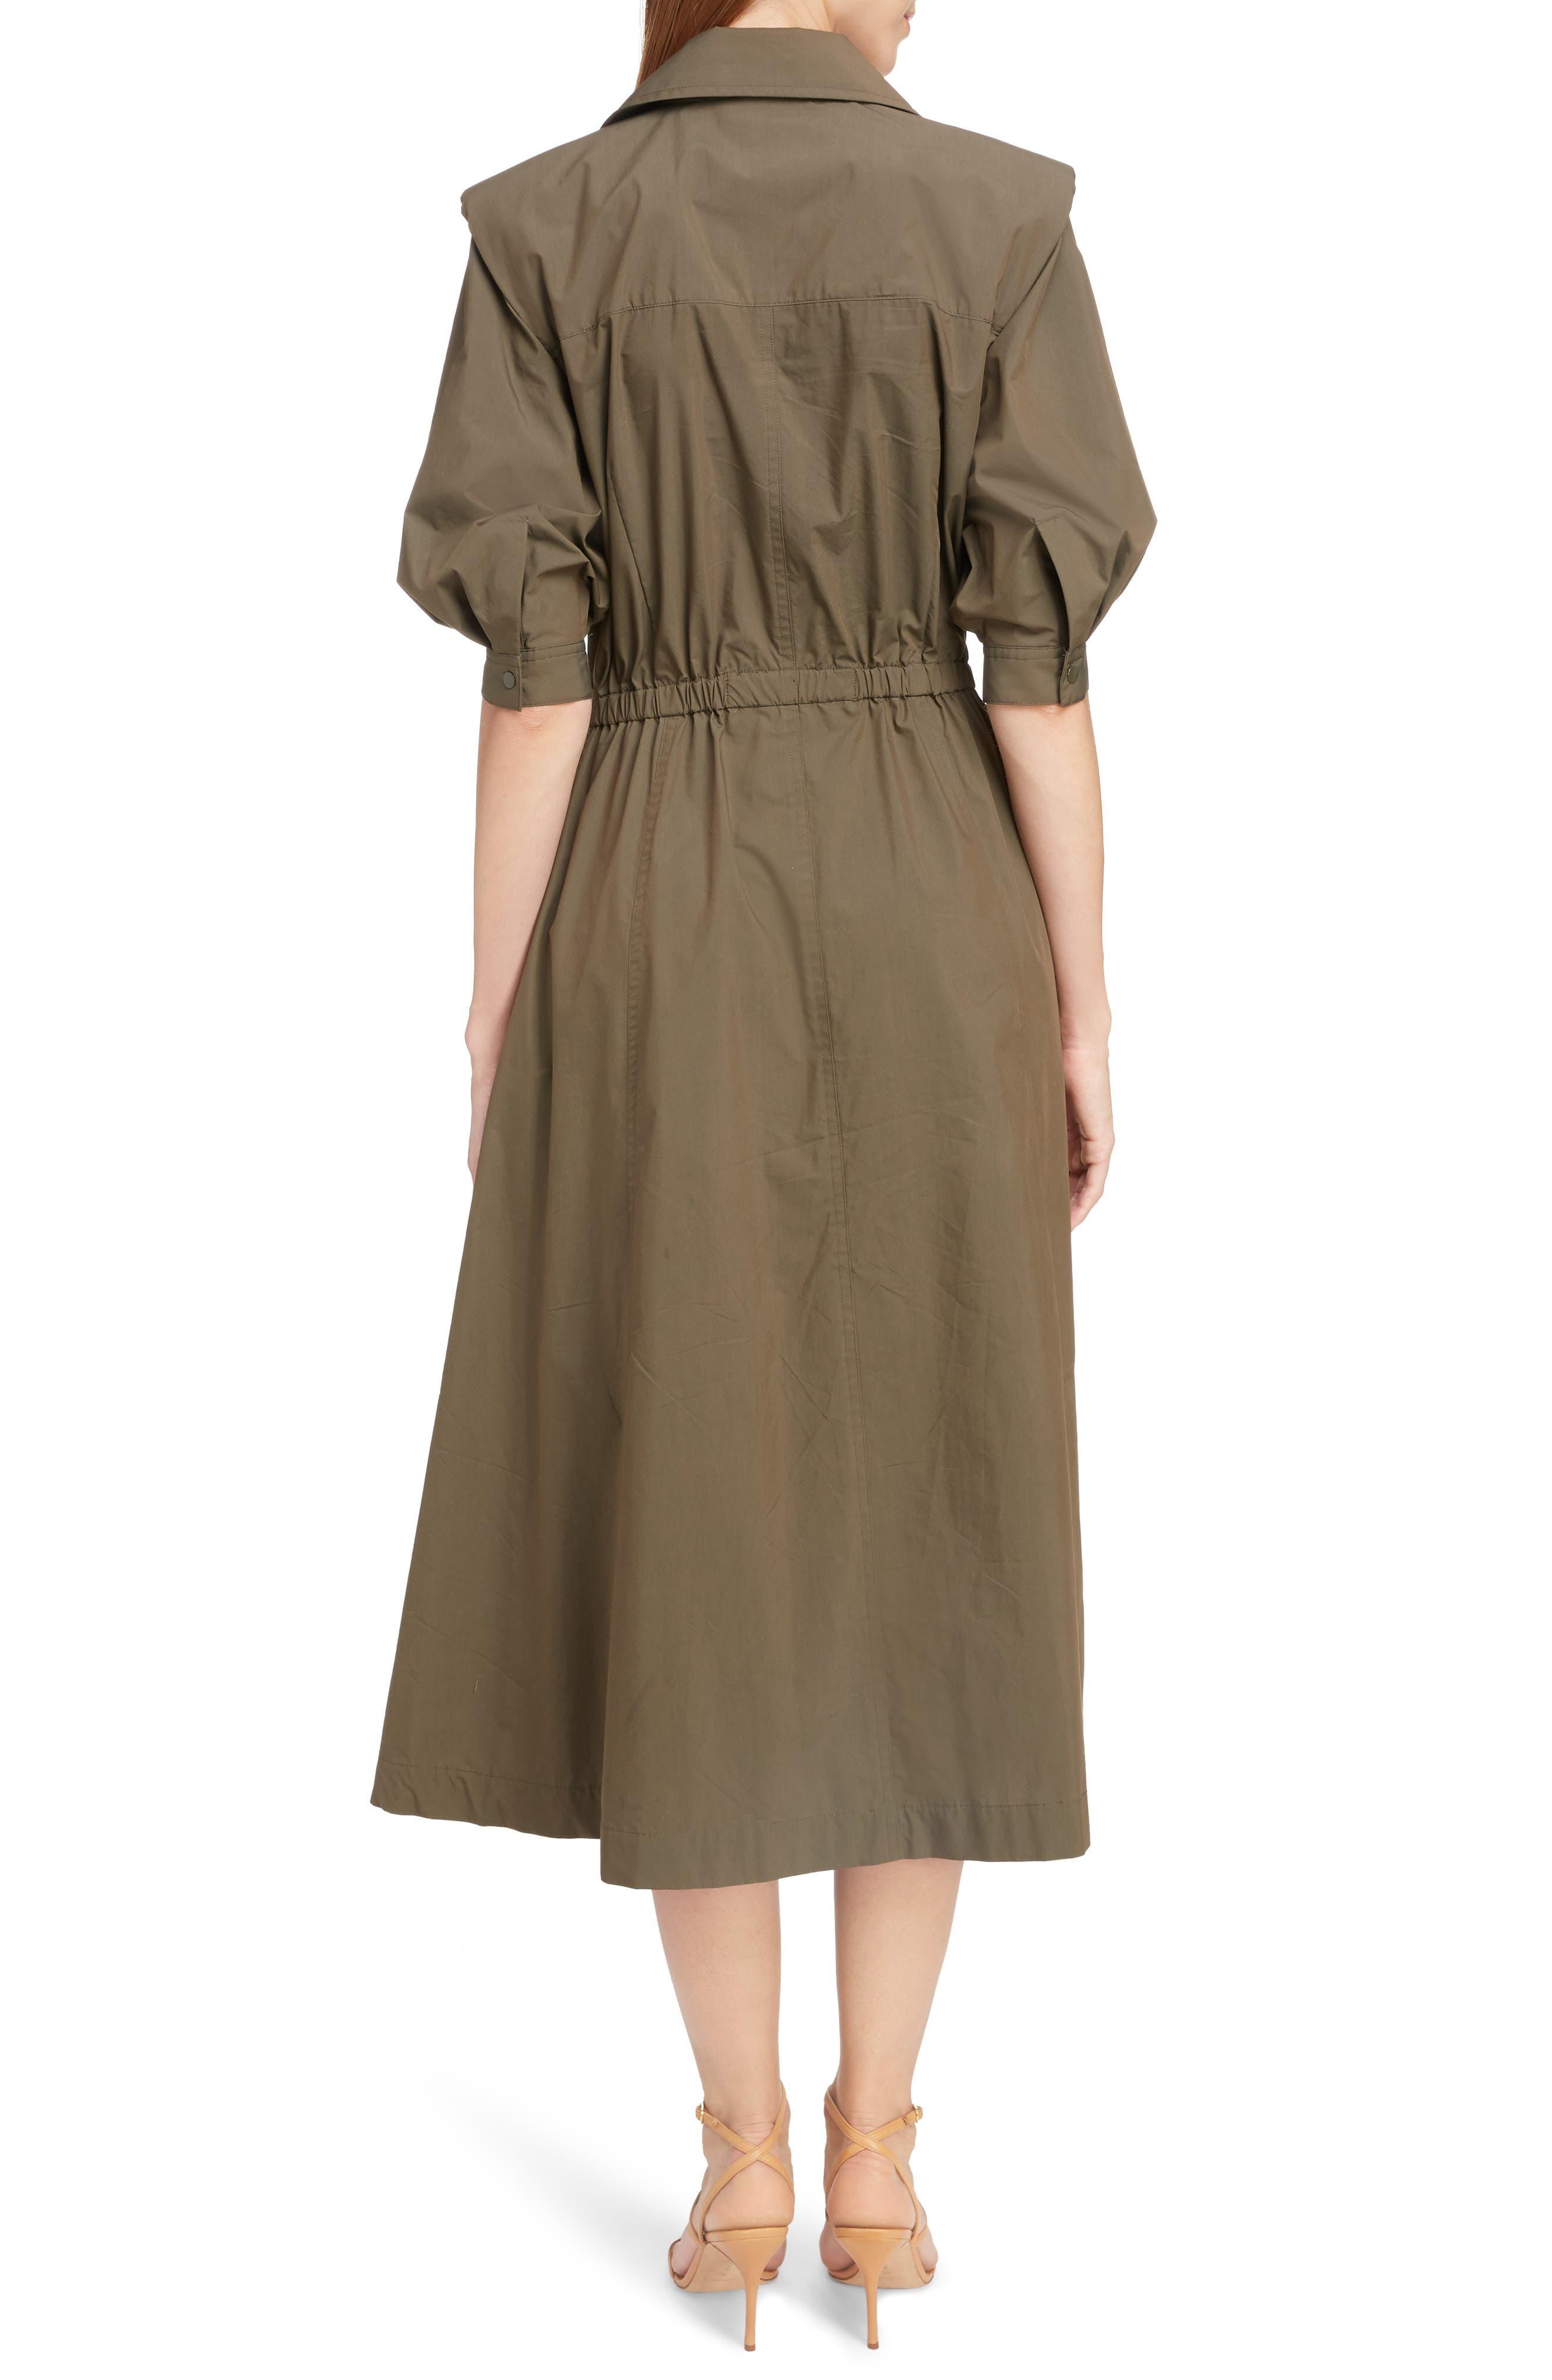 TOGA,                             Trench Taffeta Shirtdress,                             Alternate thumbnail 2, color,                             BROWN